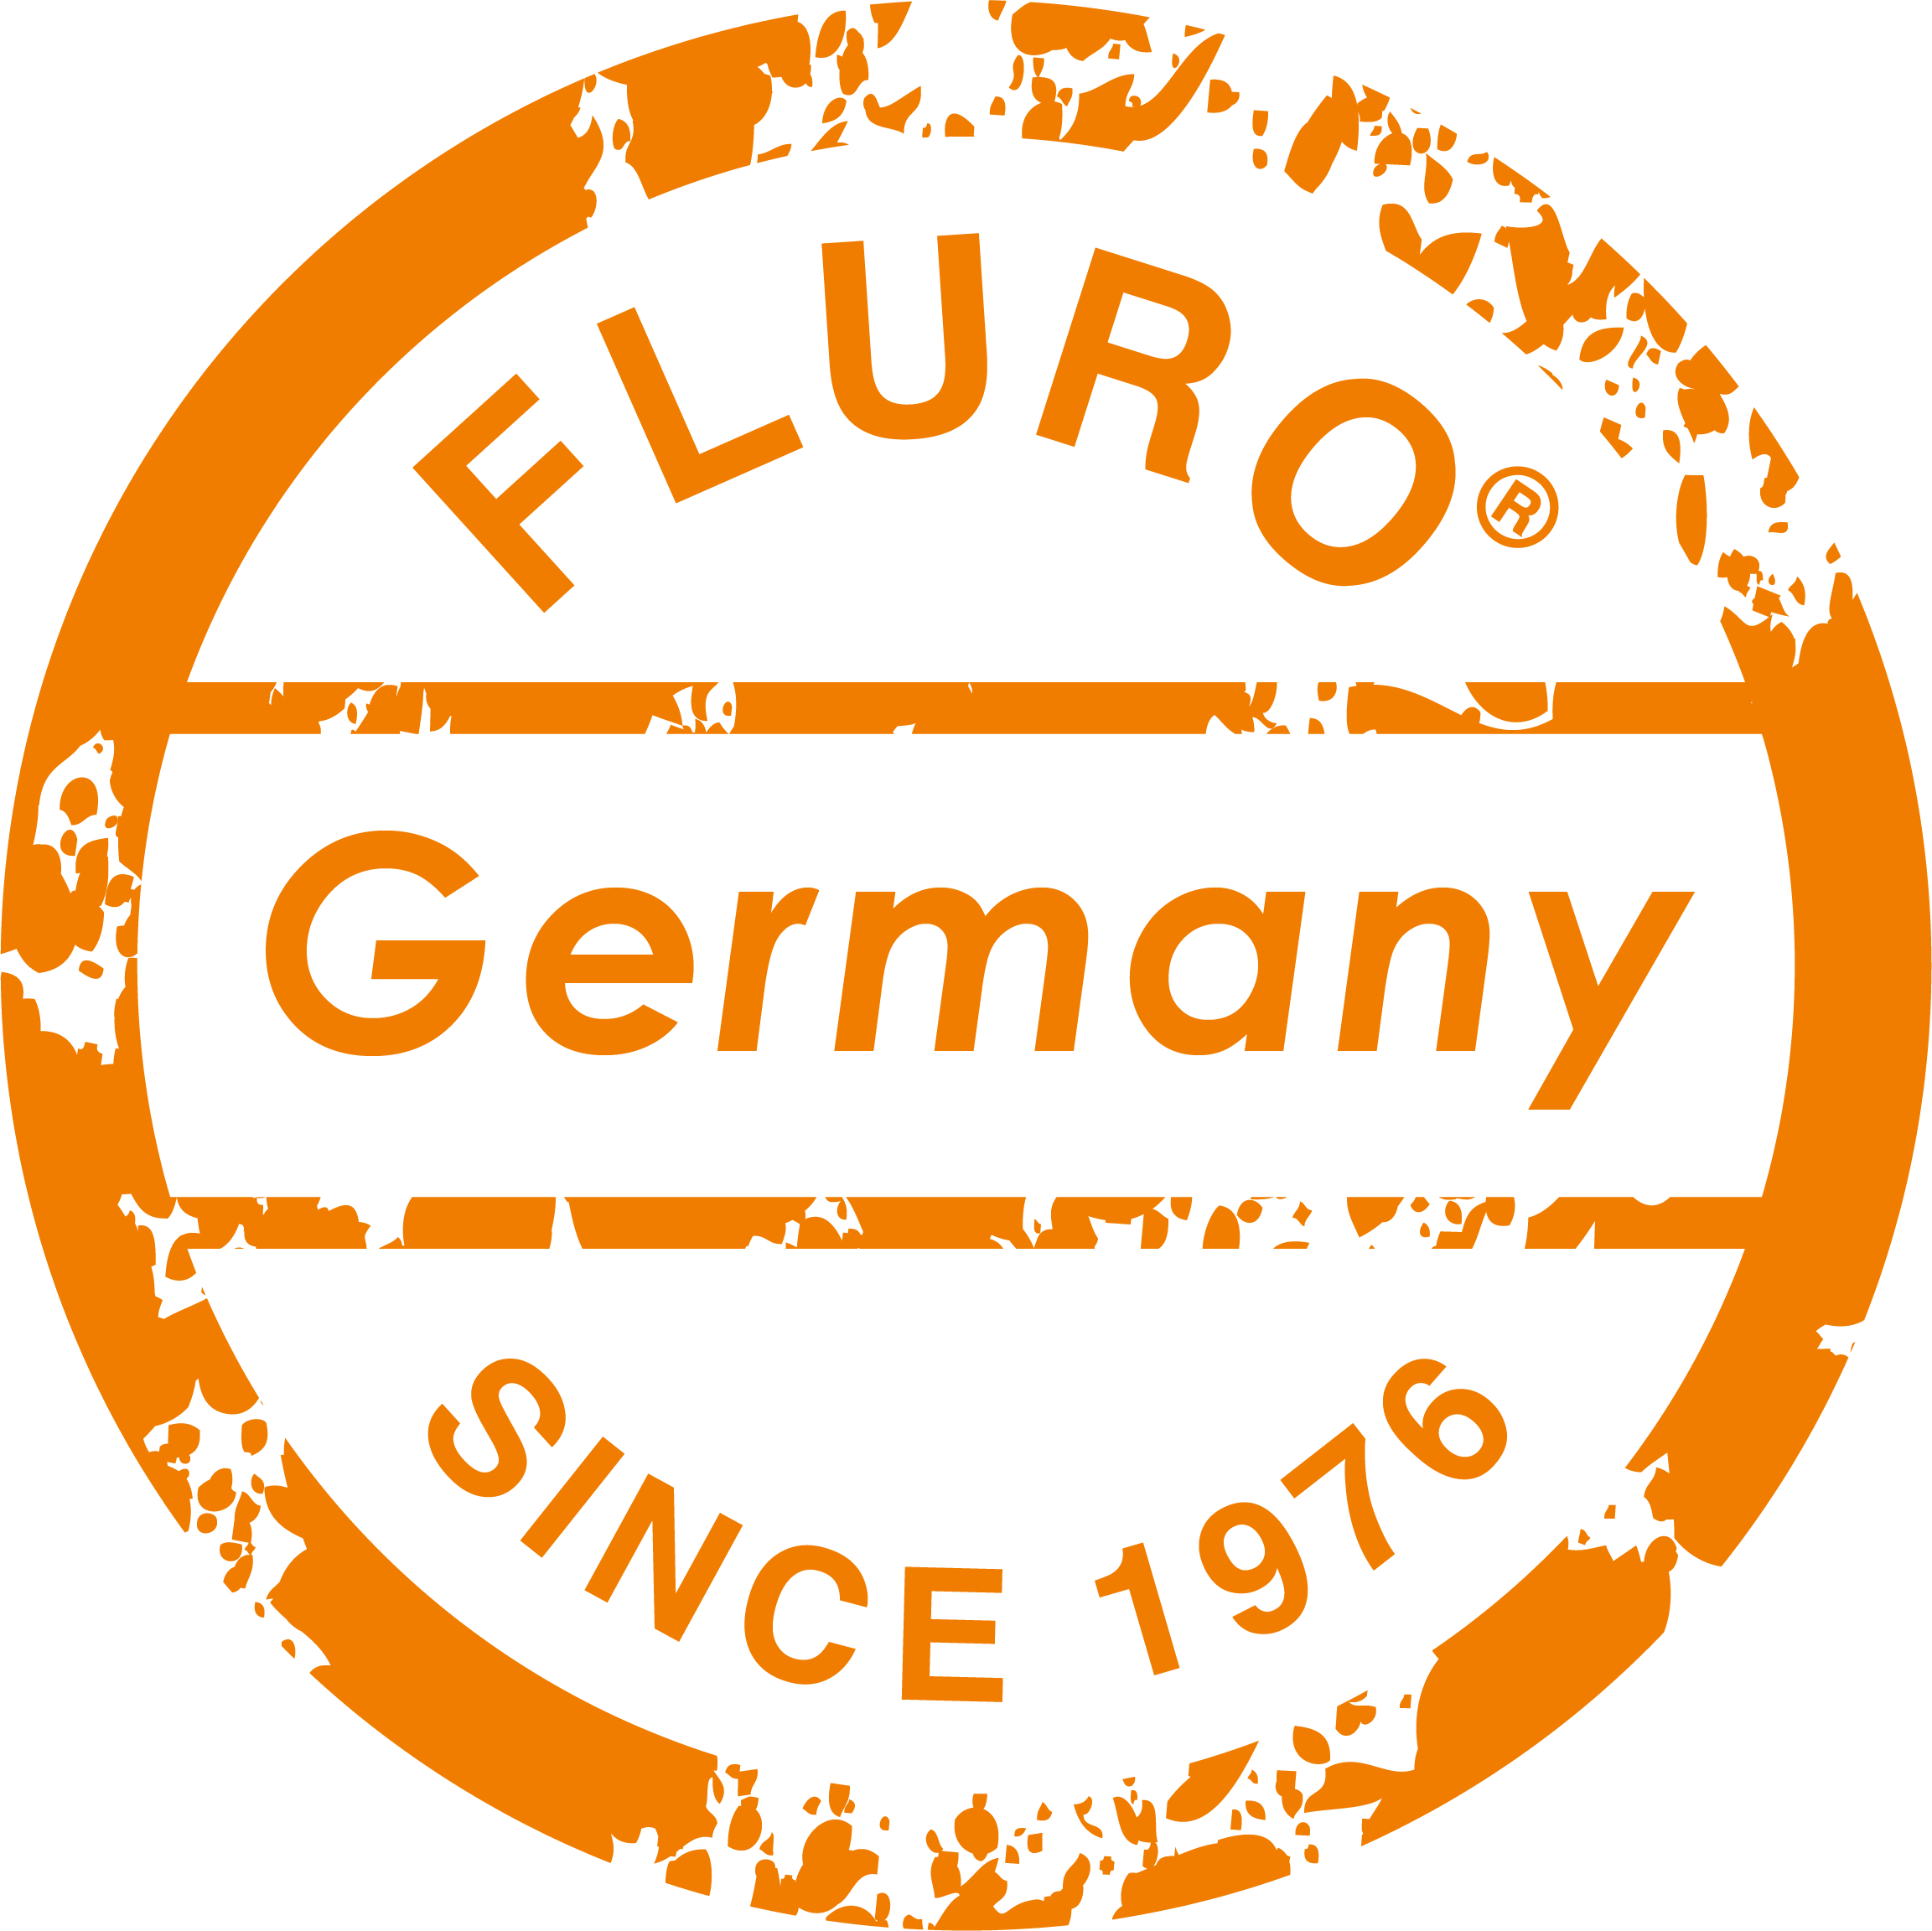 FLURO®-GELENKLAGER GMBH